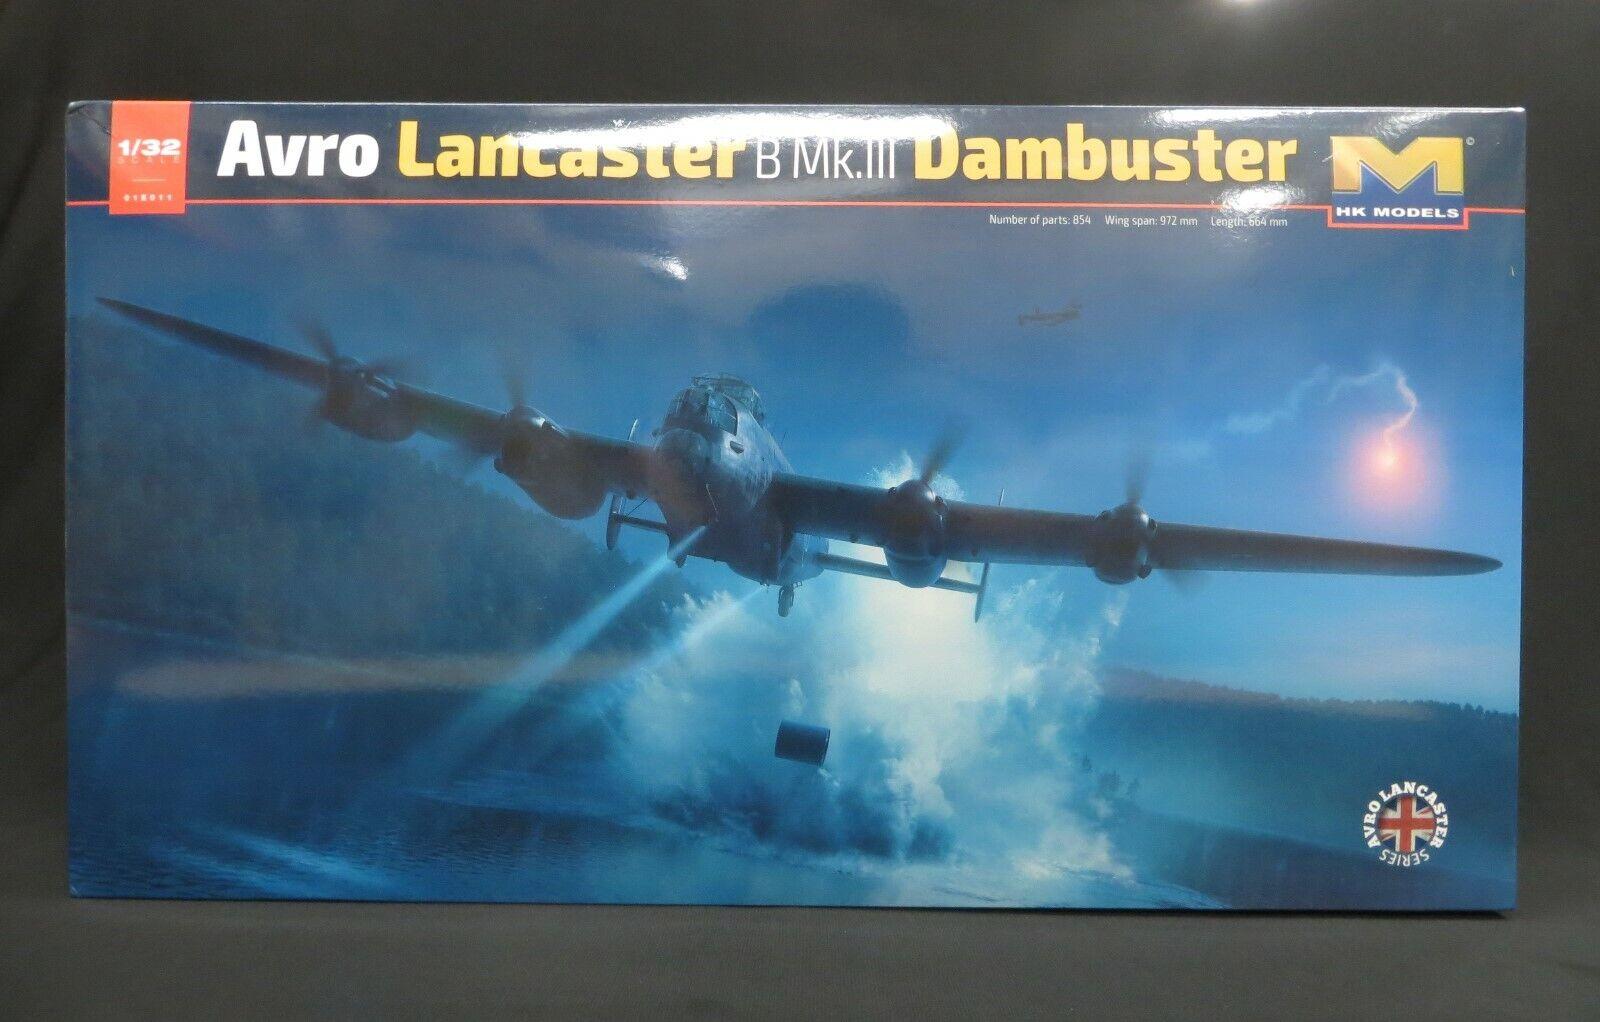 Modelo de Hong Kong - 1   32 Avro Lancaster dambuster - modelo de Hong Kong 01e011